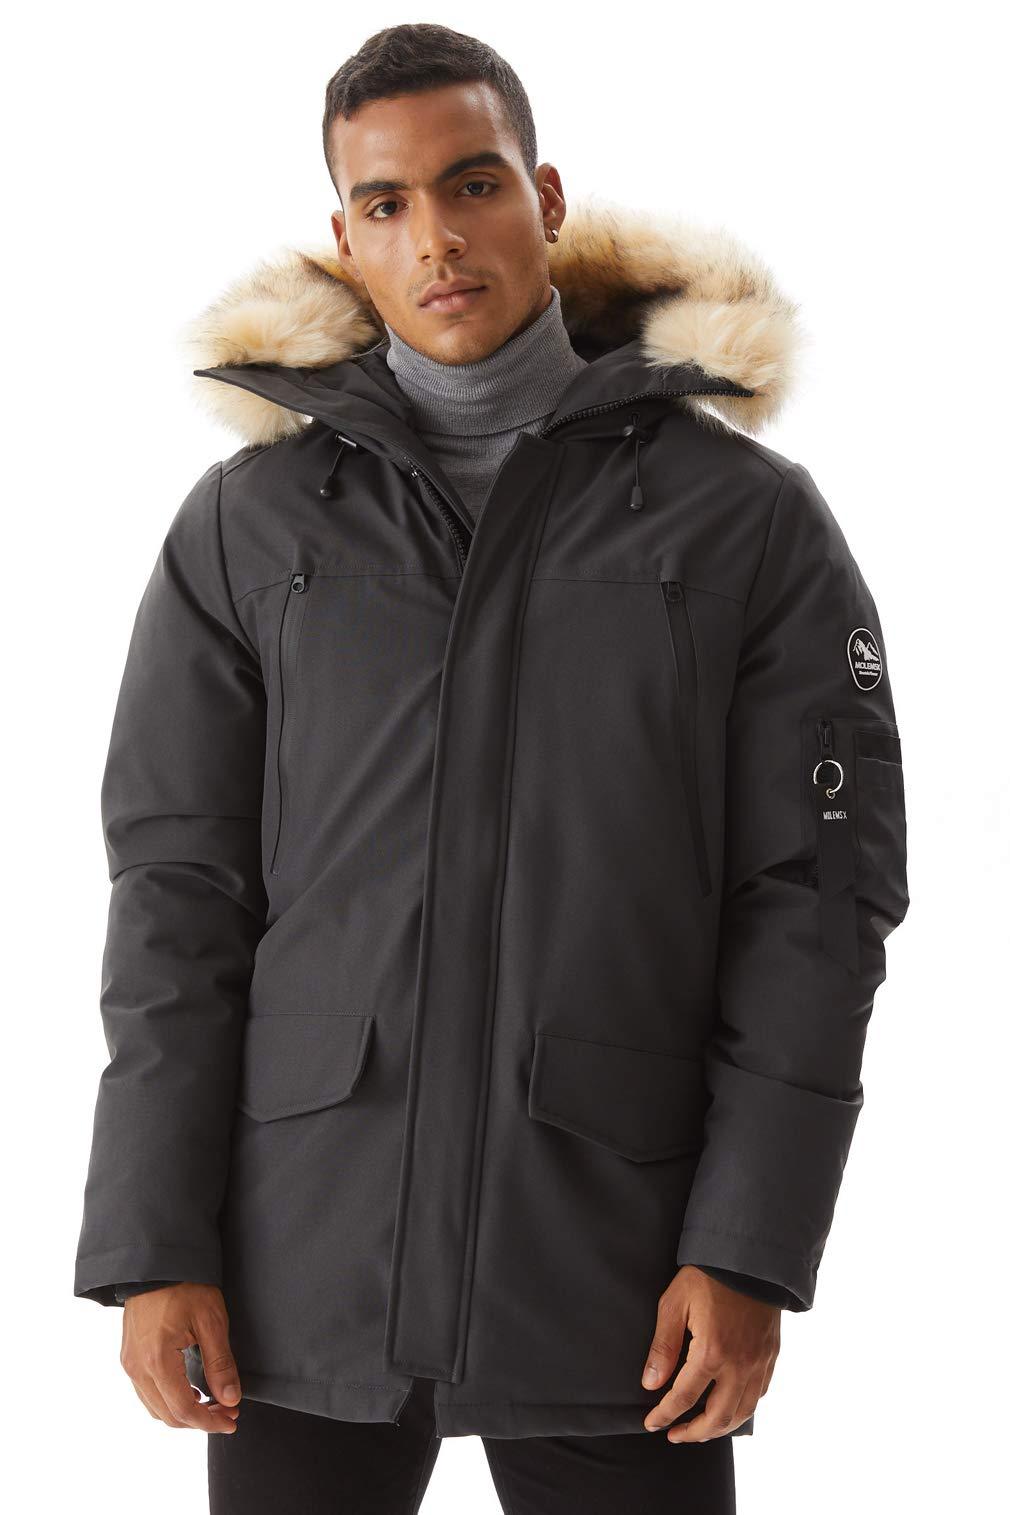 Molemsx Winter Coats for Men, Down Jacket Men Warm Parka Puffer Jacket Winter Down Jacket with Hood Faux-Fur Trim Grey Medium by Molemsx